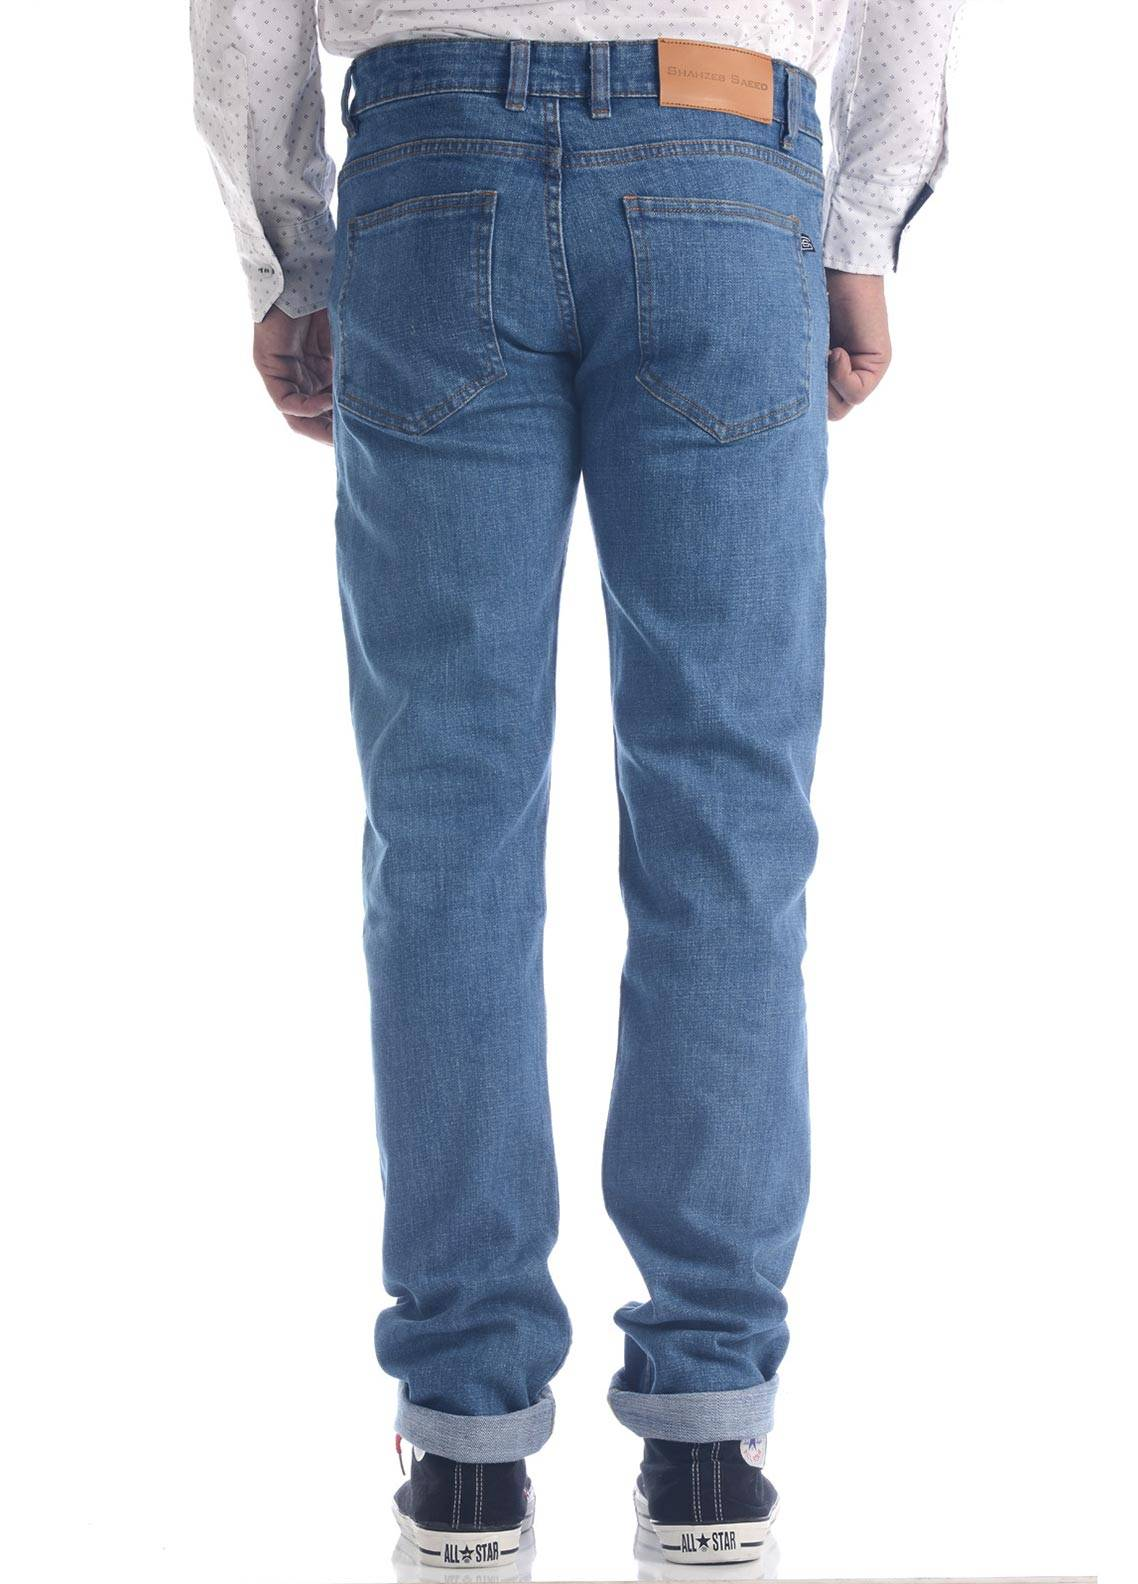 Shahzeb Saeed Denim Casual Jeans for Men - Blue DNM-90